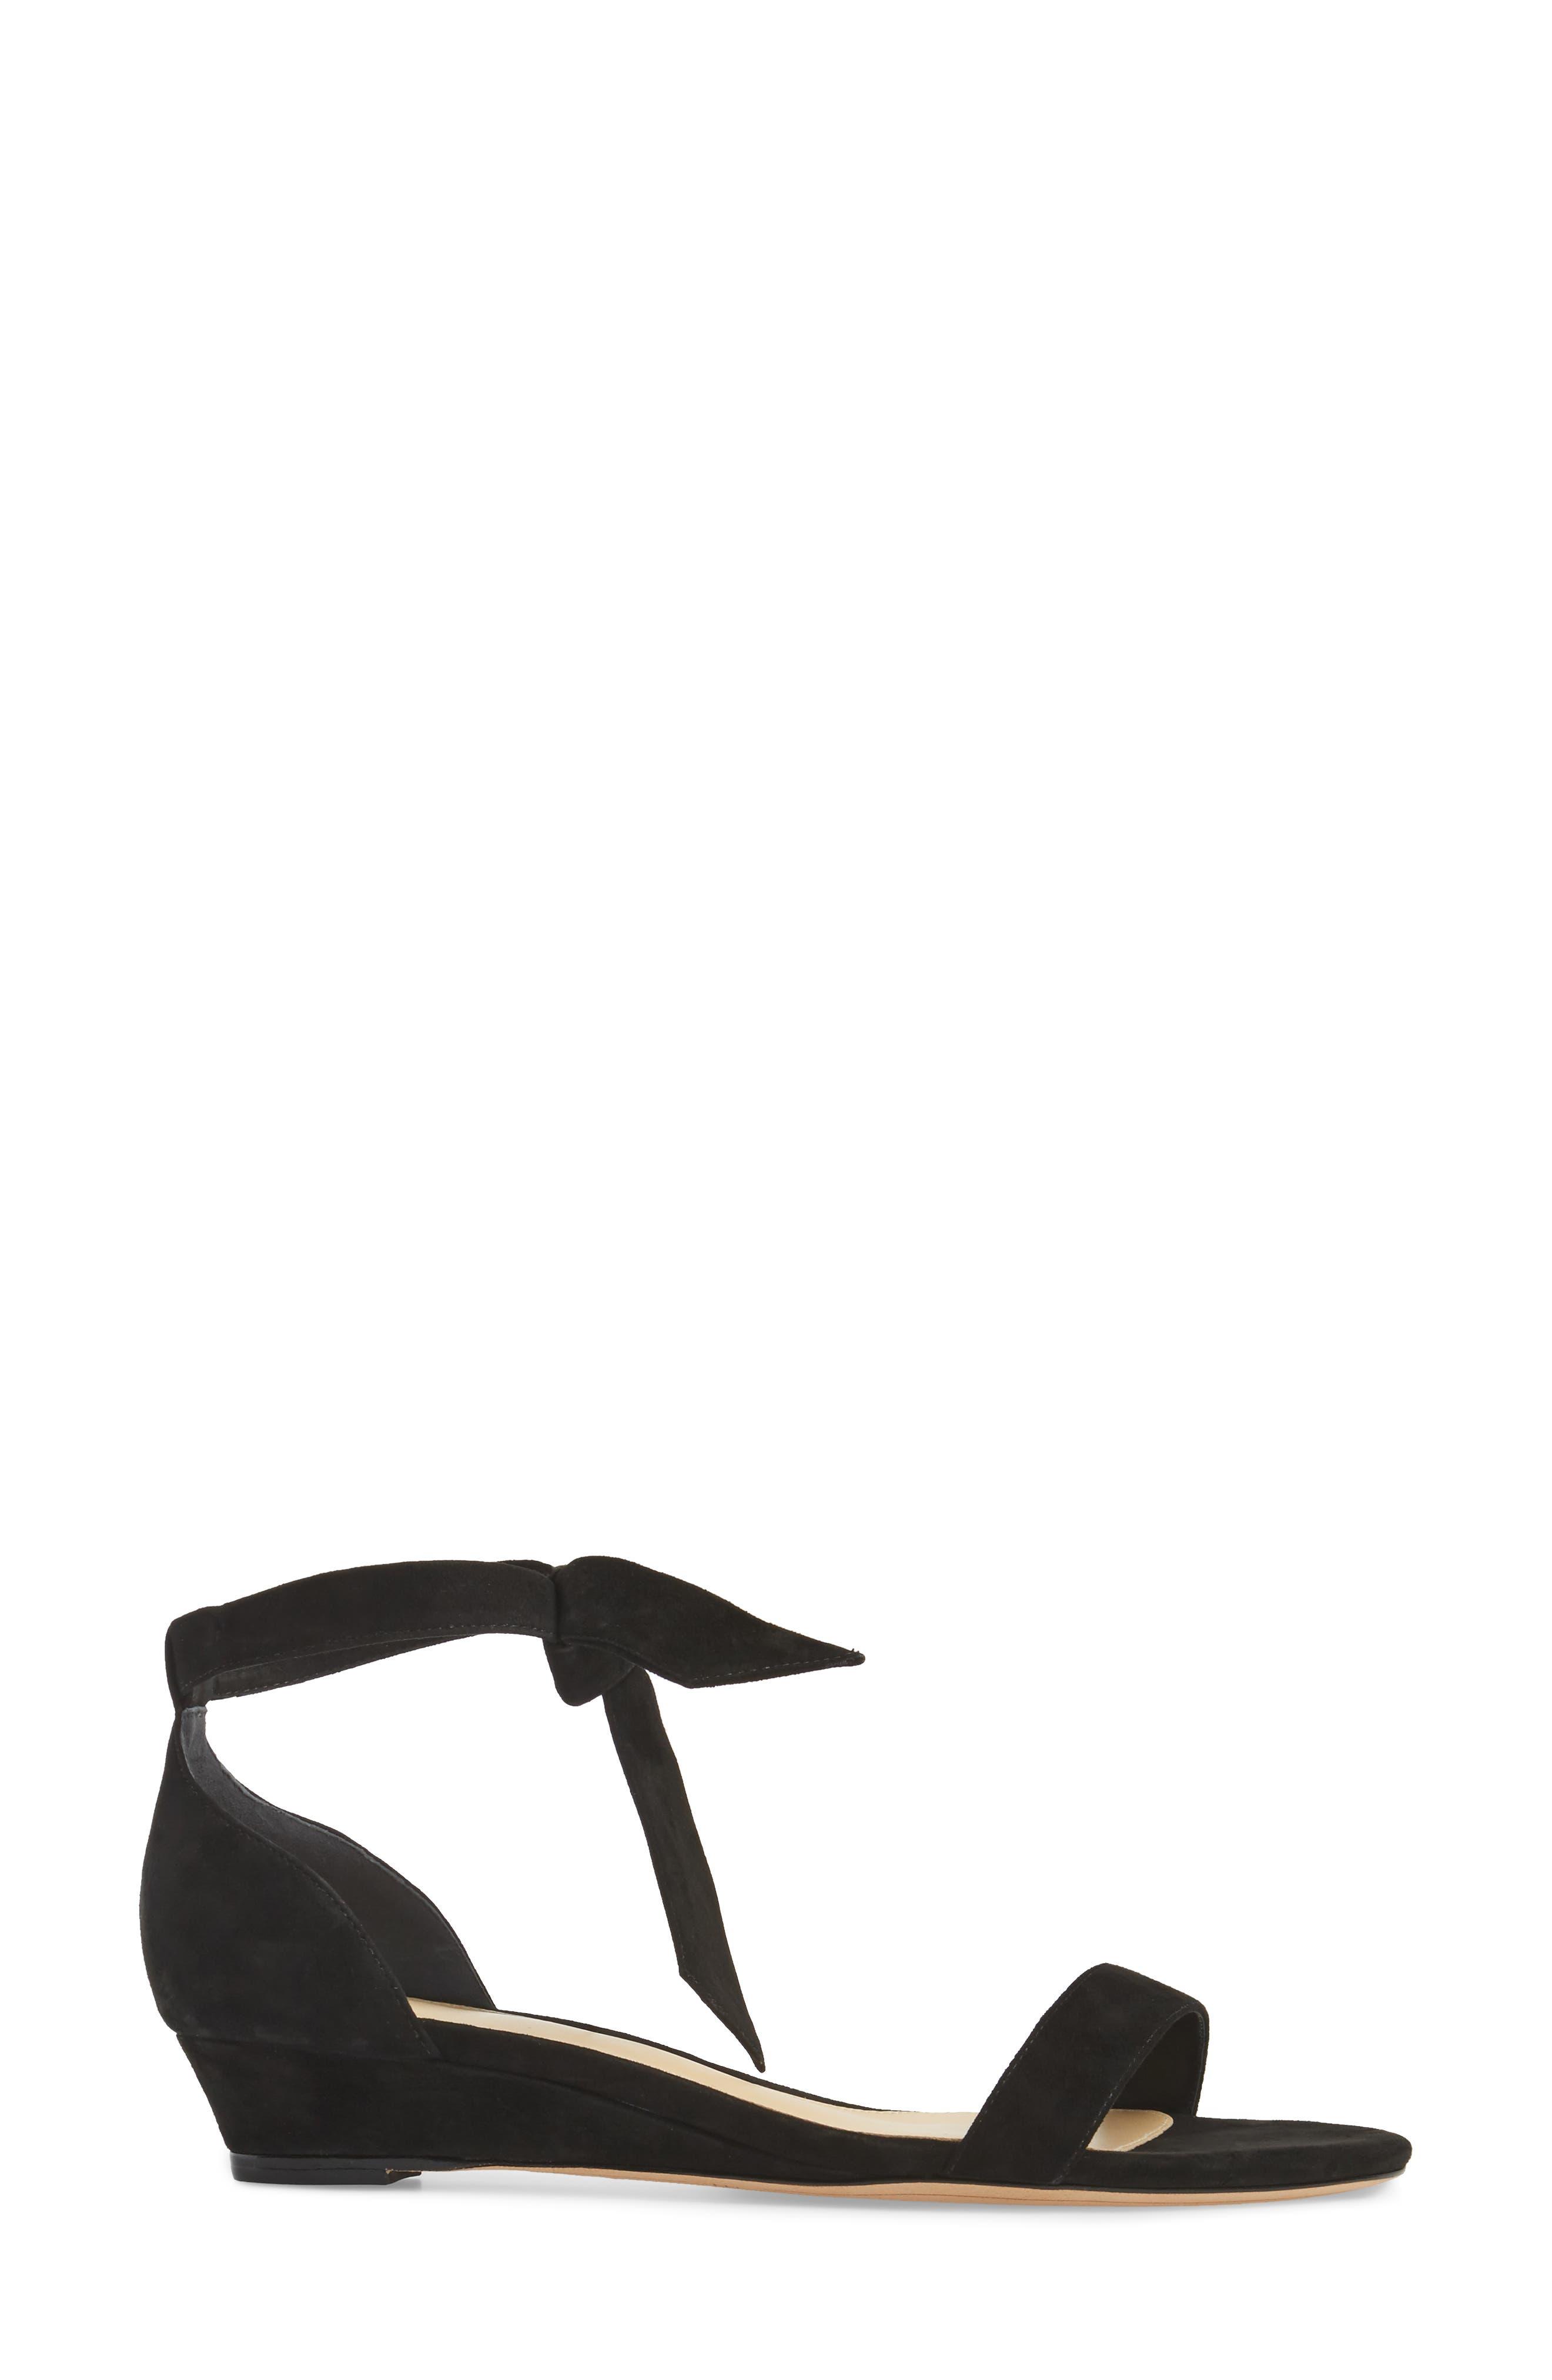 Atena Tie Strap Wedge Sandal,                             Alternate thumbnail 3, color,                             001